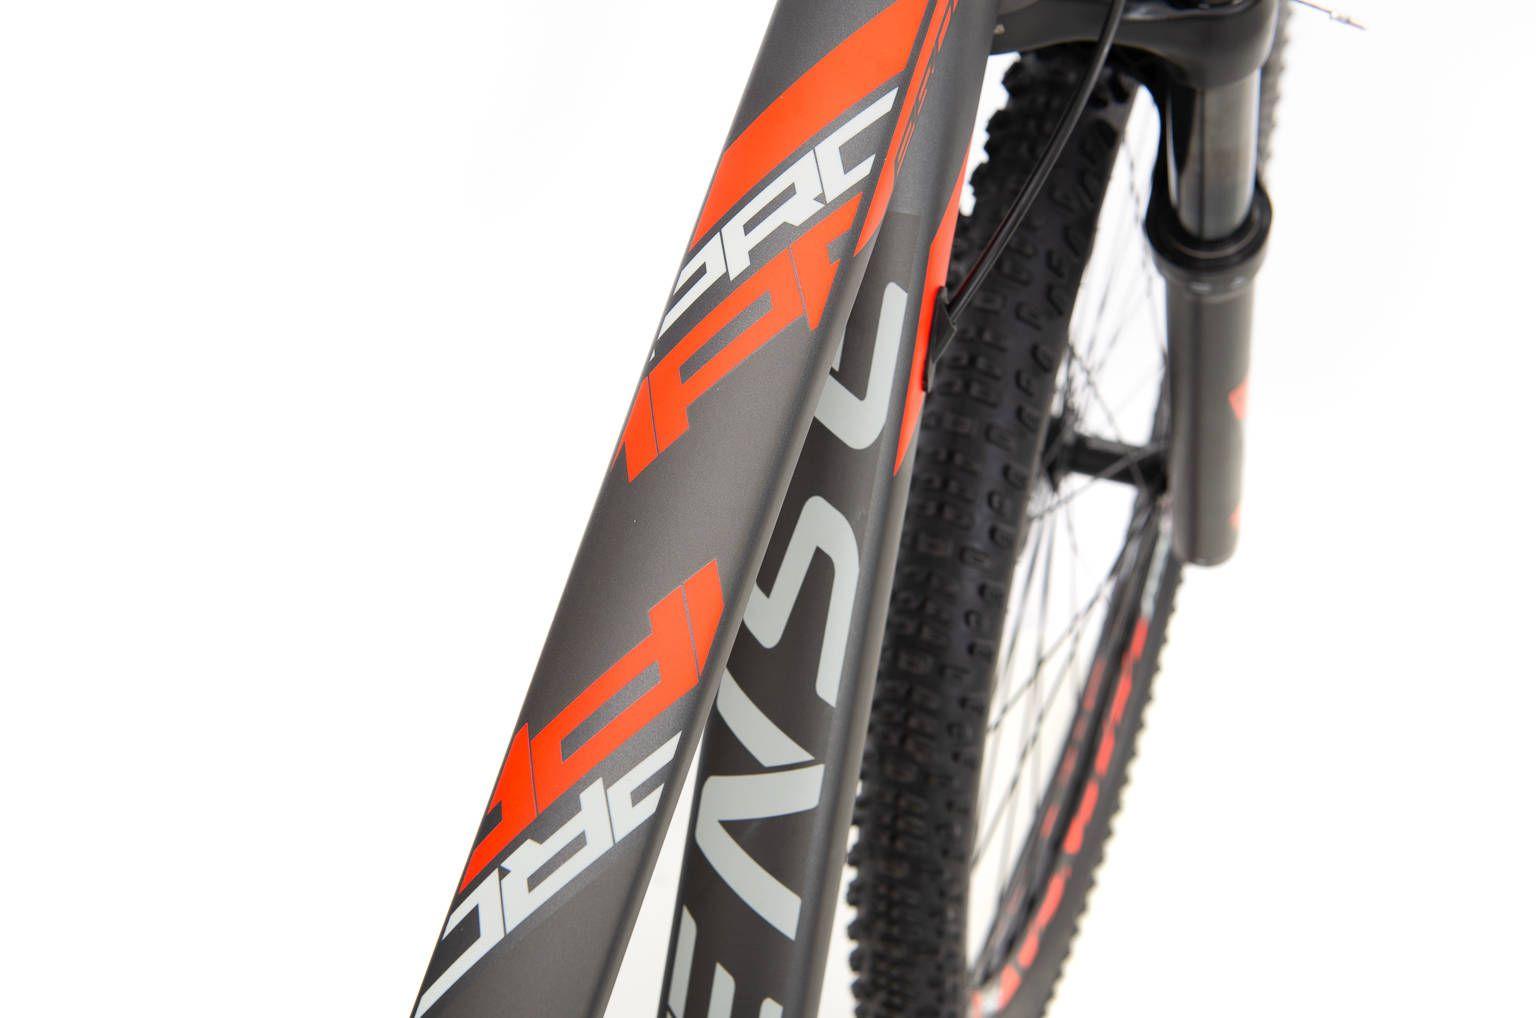 Bicicleta SENSE Impact Pro 2020 - 20v Shimano Deore - Vermelho Neon/Chumbo